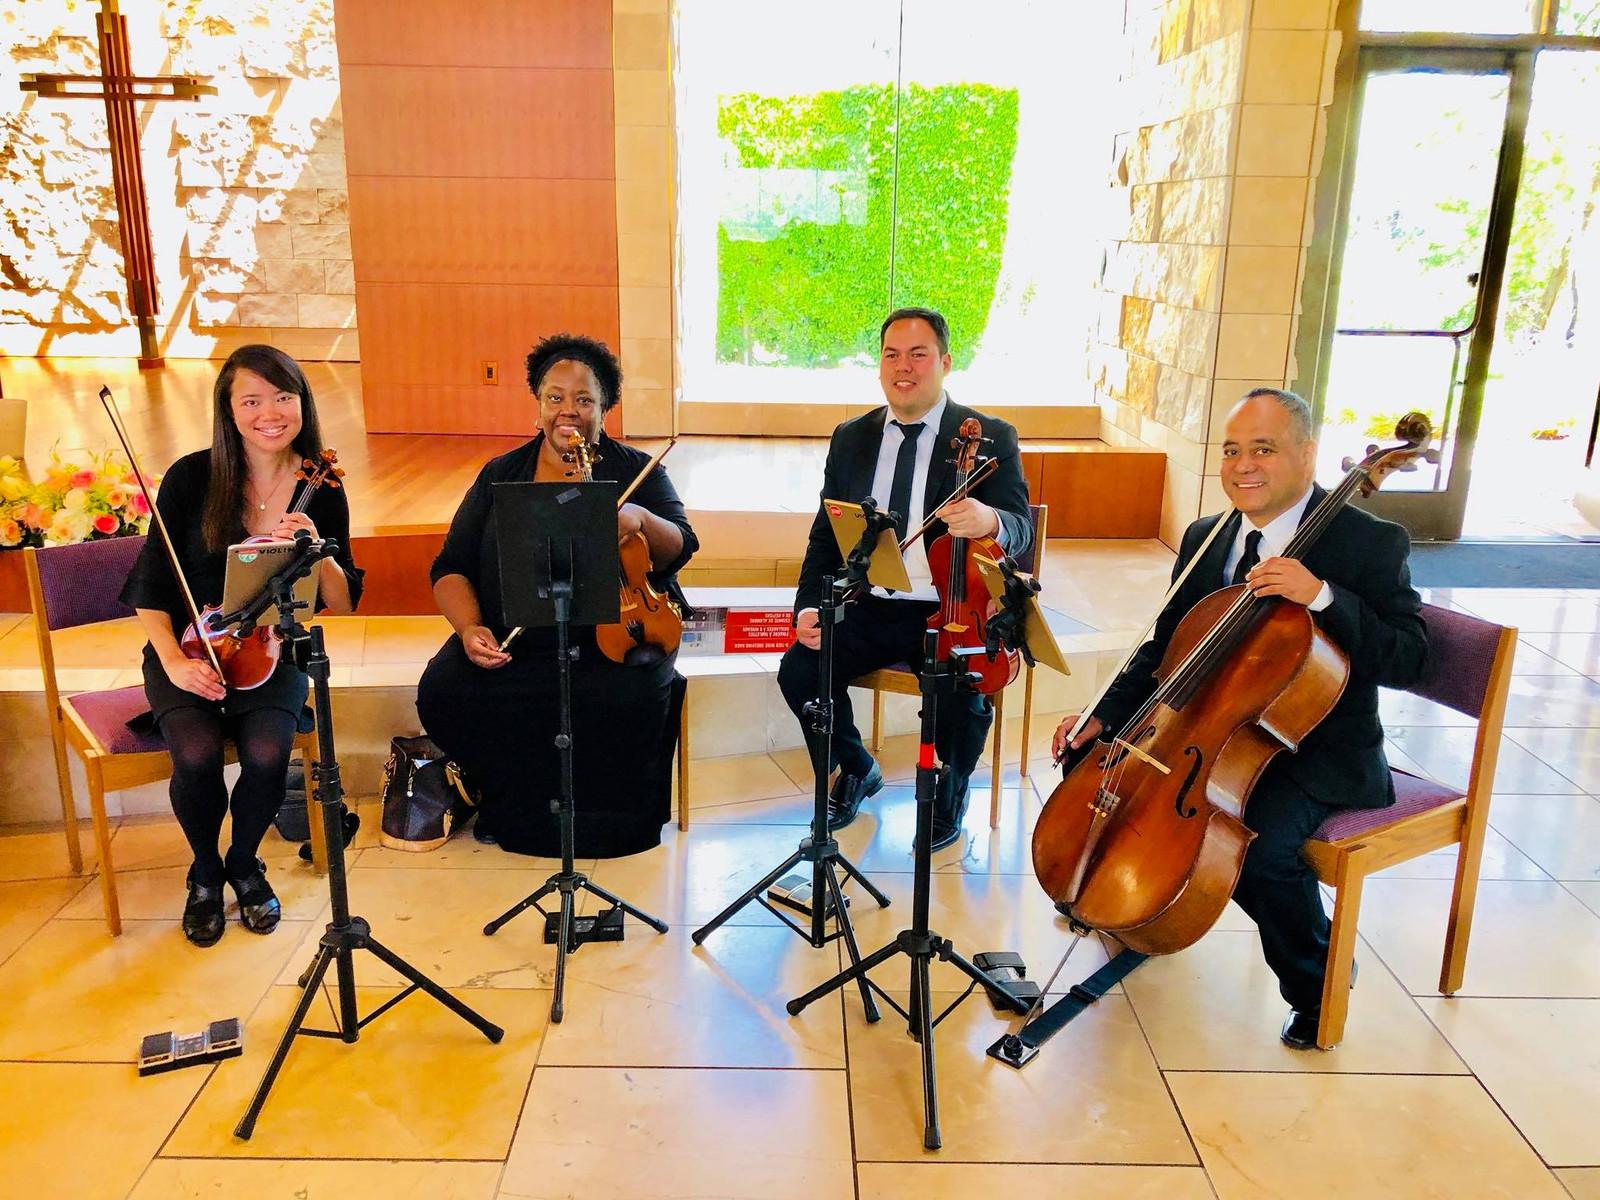 Wedding String Quartet | String Quartet Wedding Southern California Ocdamia Music Group Llc